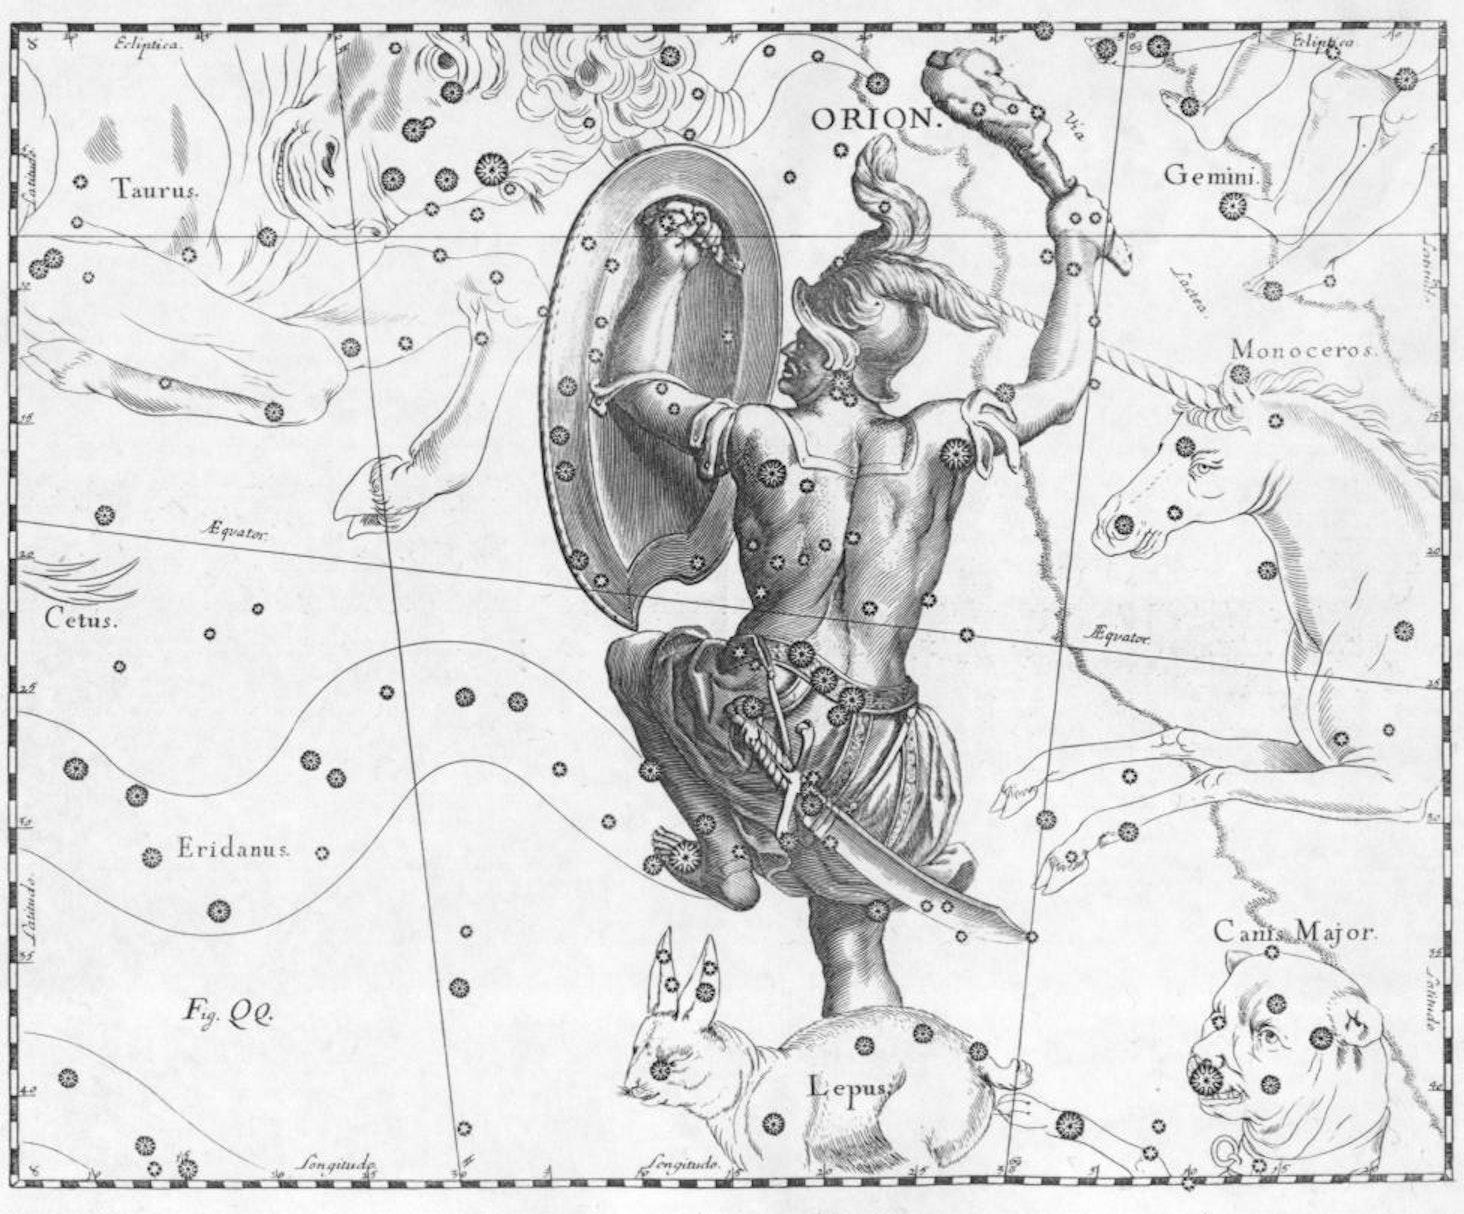 Orion: the original fuckboi